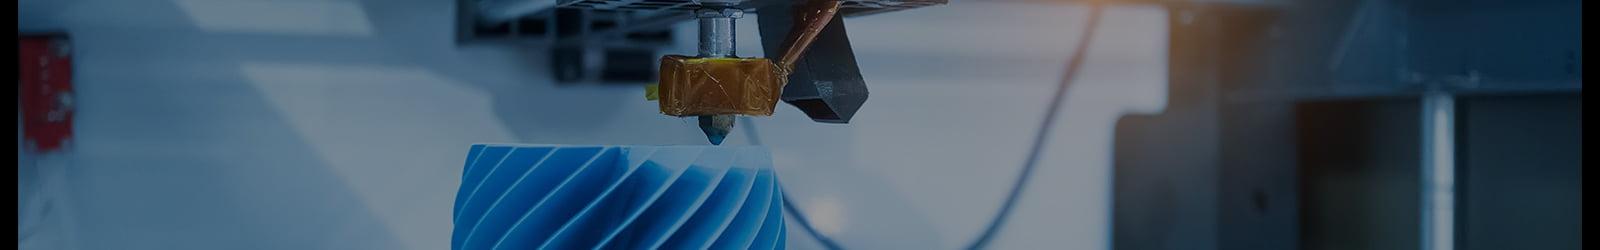 3Dプリンターとは